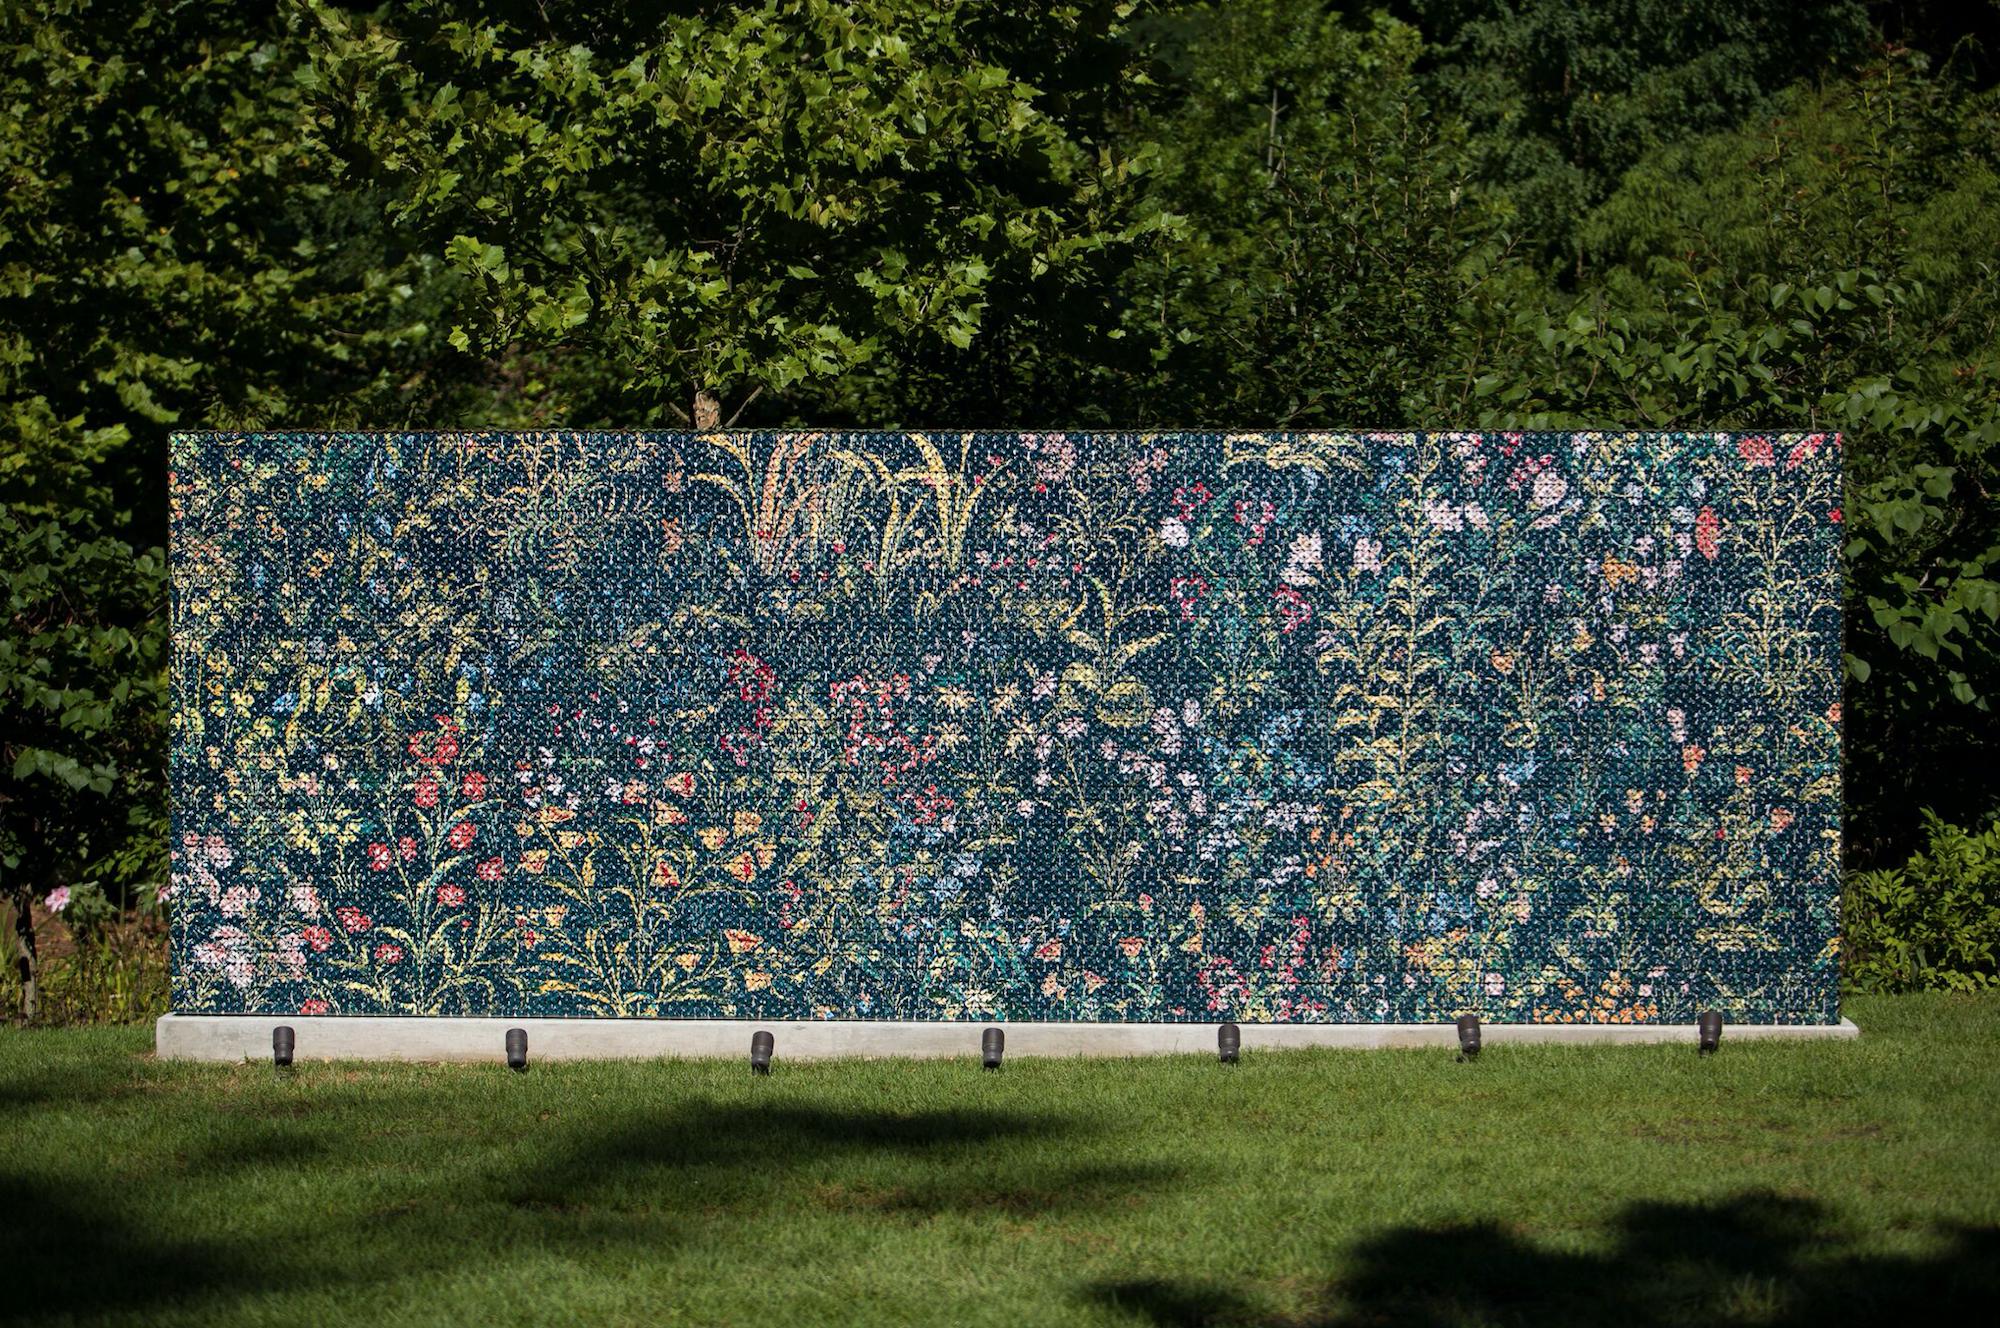 Kim Dickey,  Mille-Fleur ( detail), 2011. Courtesy of Crystal Bridges Museum of American Art, Bentonville, Arkansas.